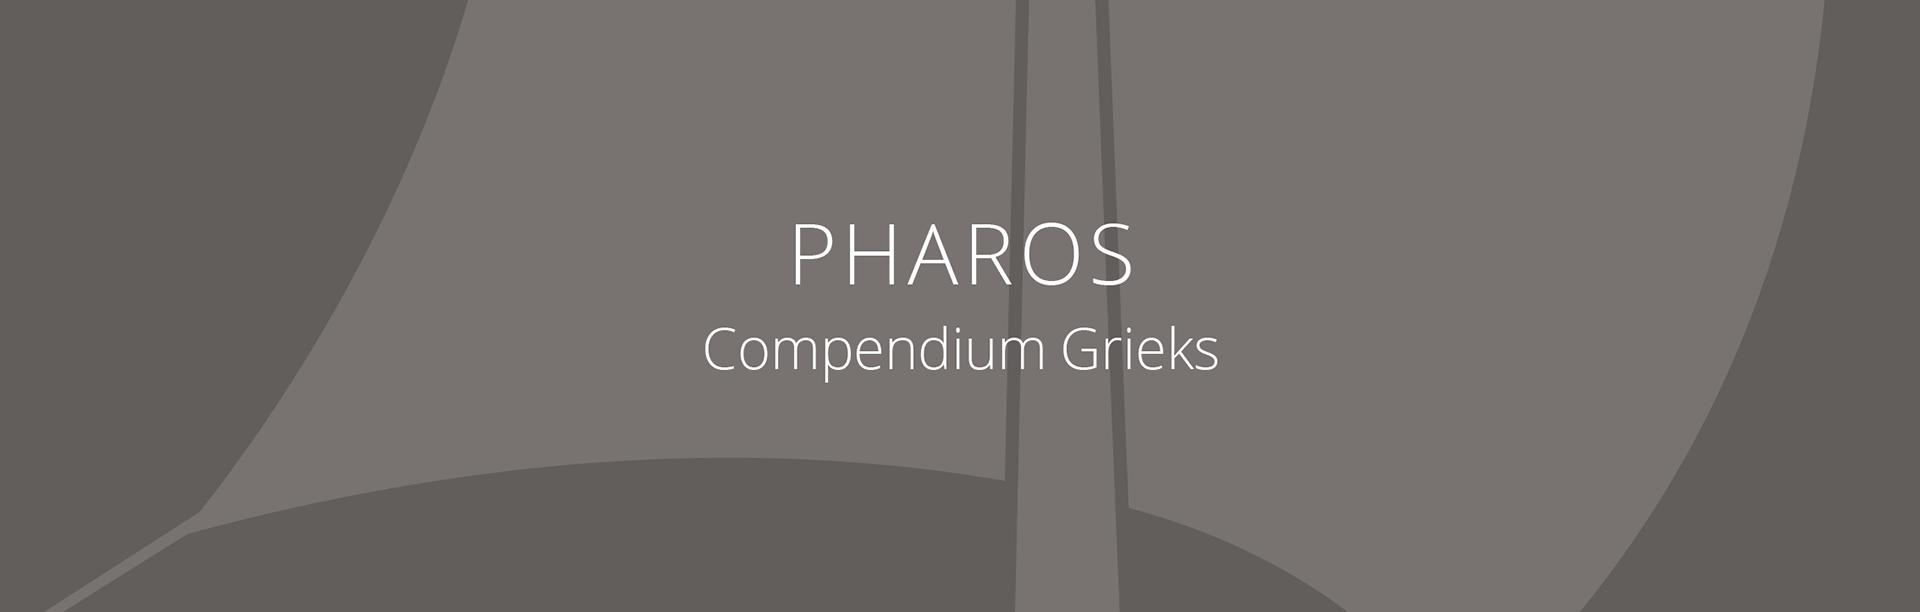 PHAROS Compendium Grieks lesmethode Staal & Roeland